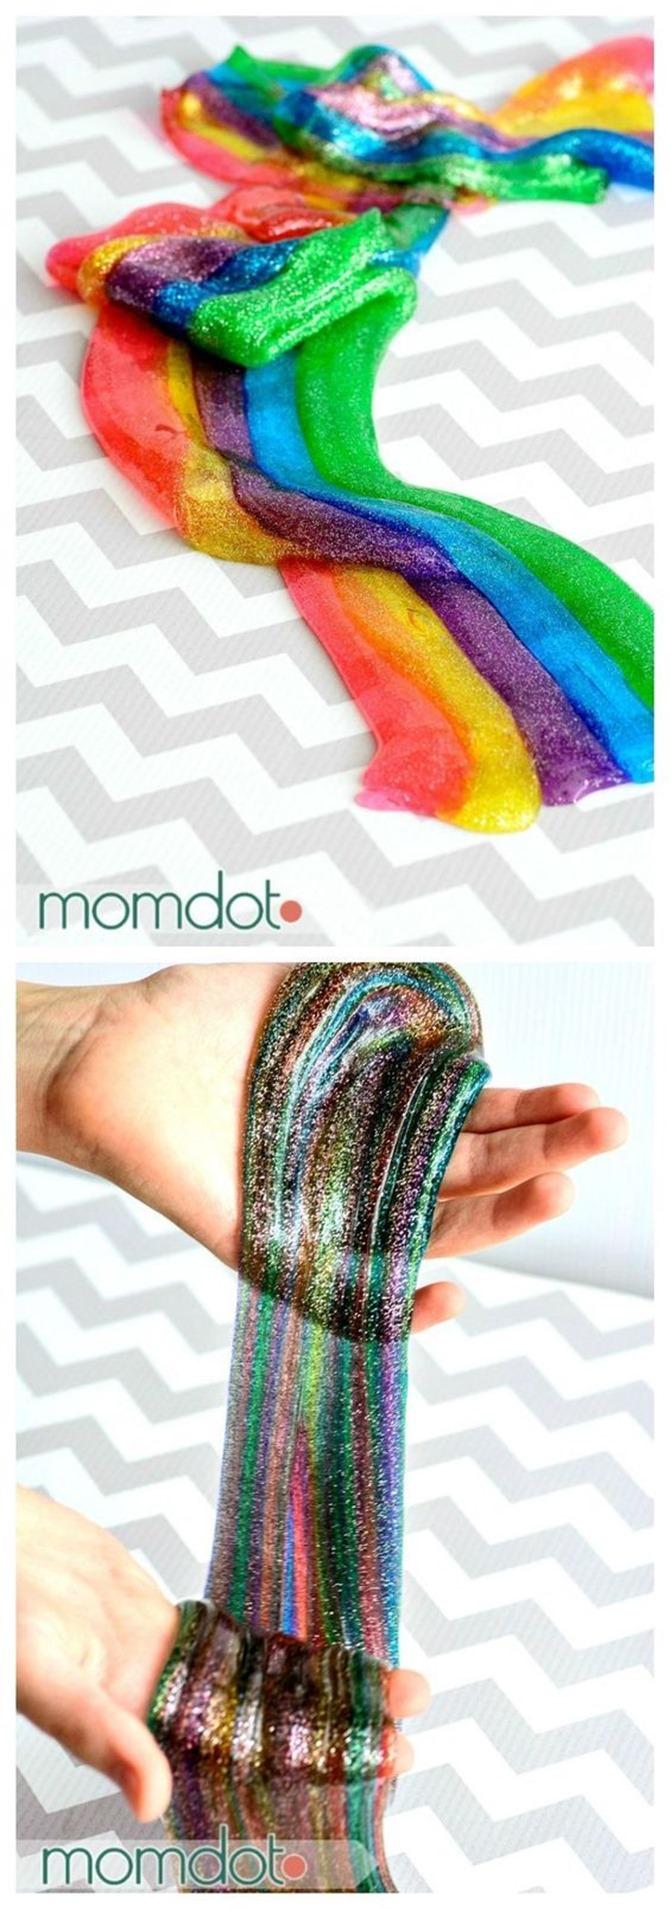 12 DIY Slime Recipes - Rainbow Tutorial